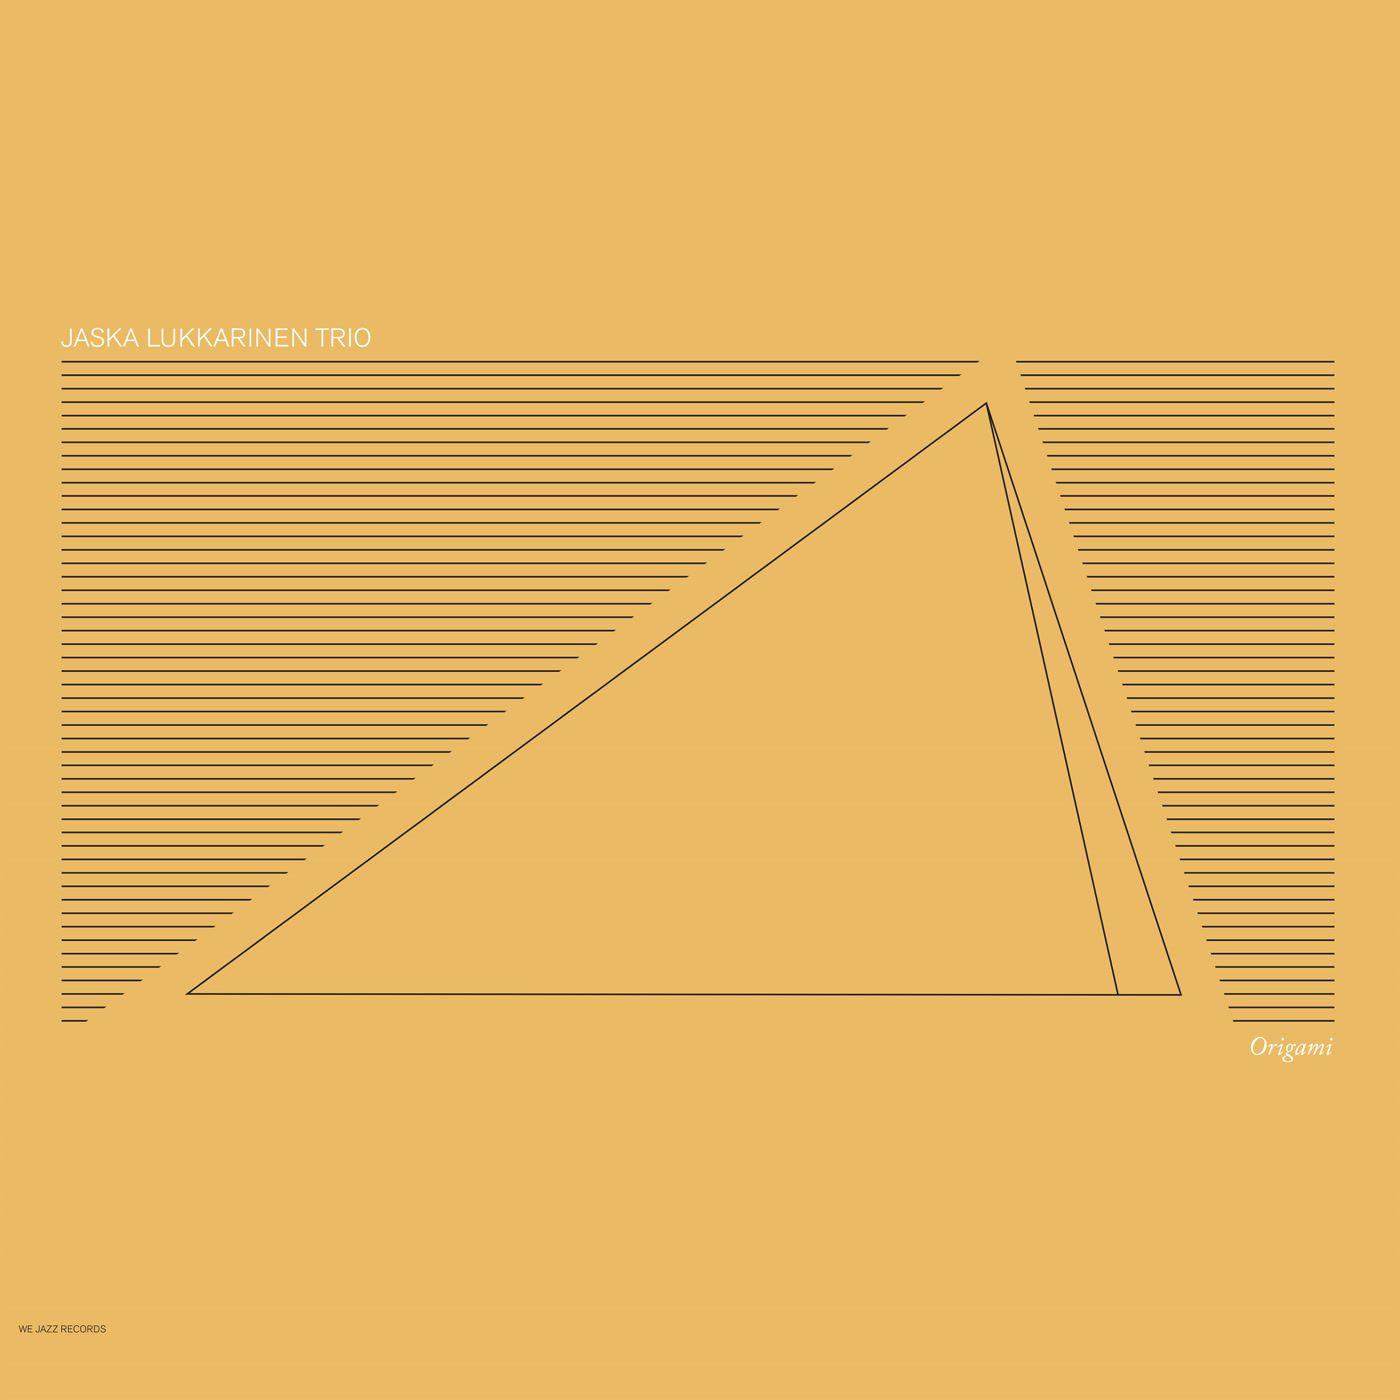 Jaska Lukkarinen Trio - Origami